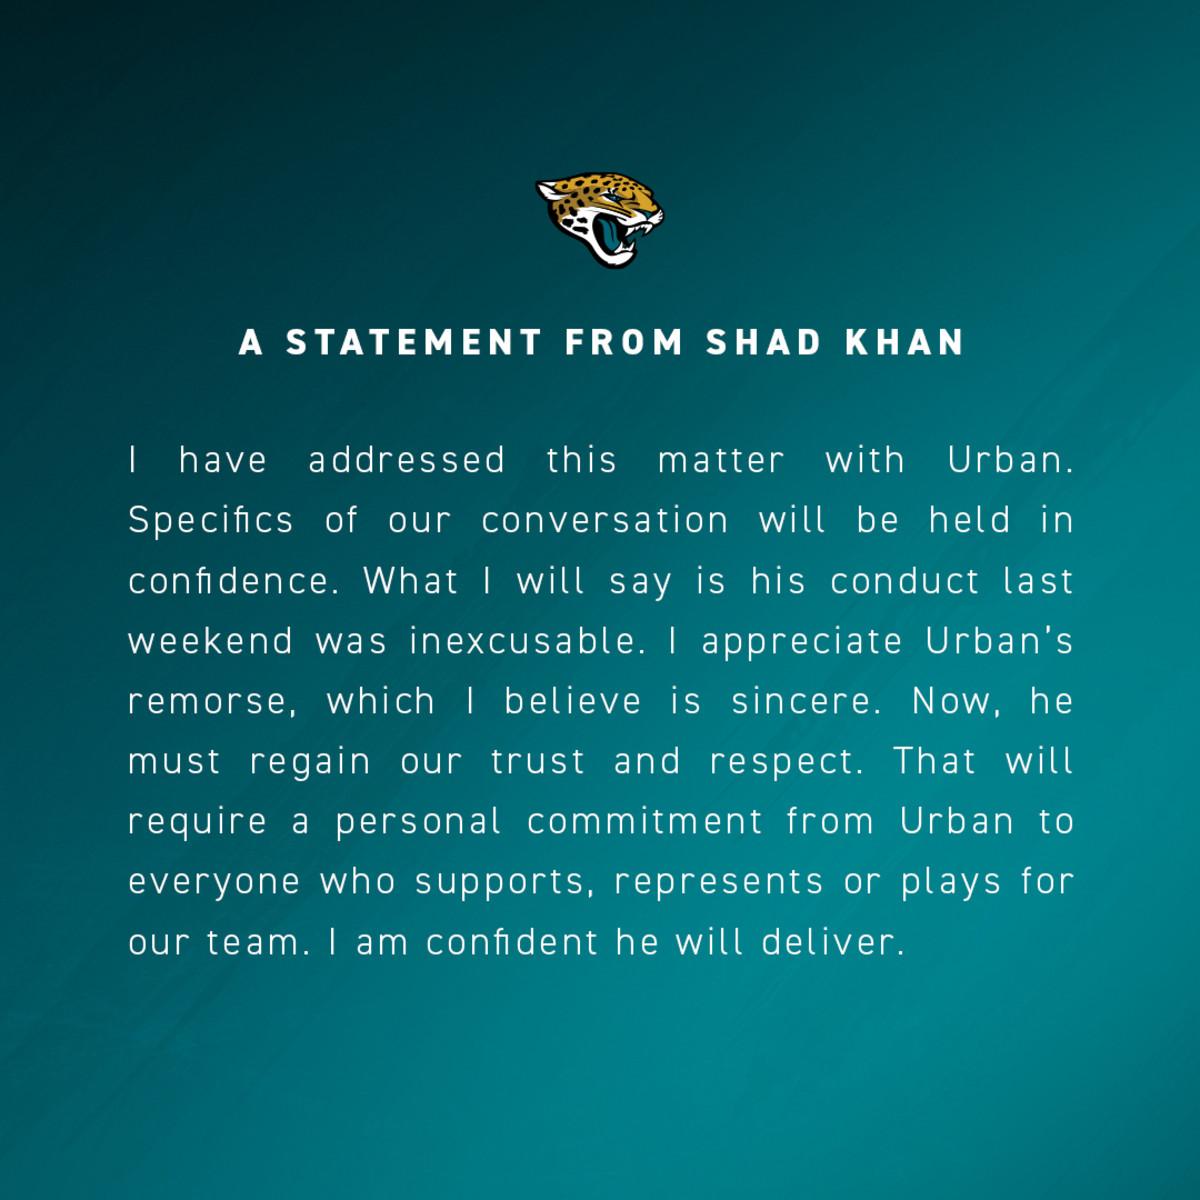 Khan statement